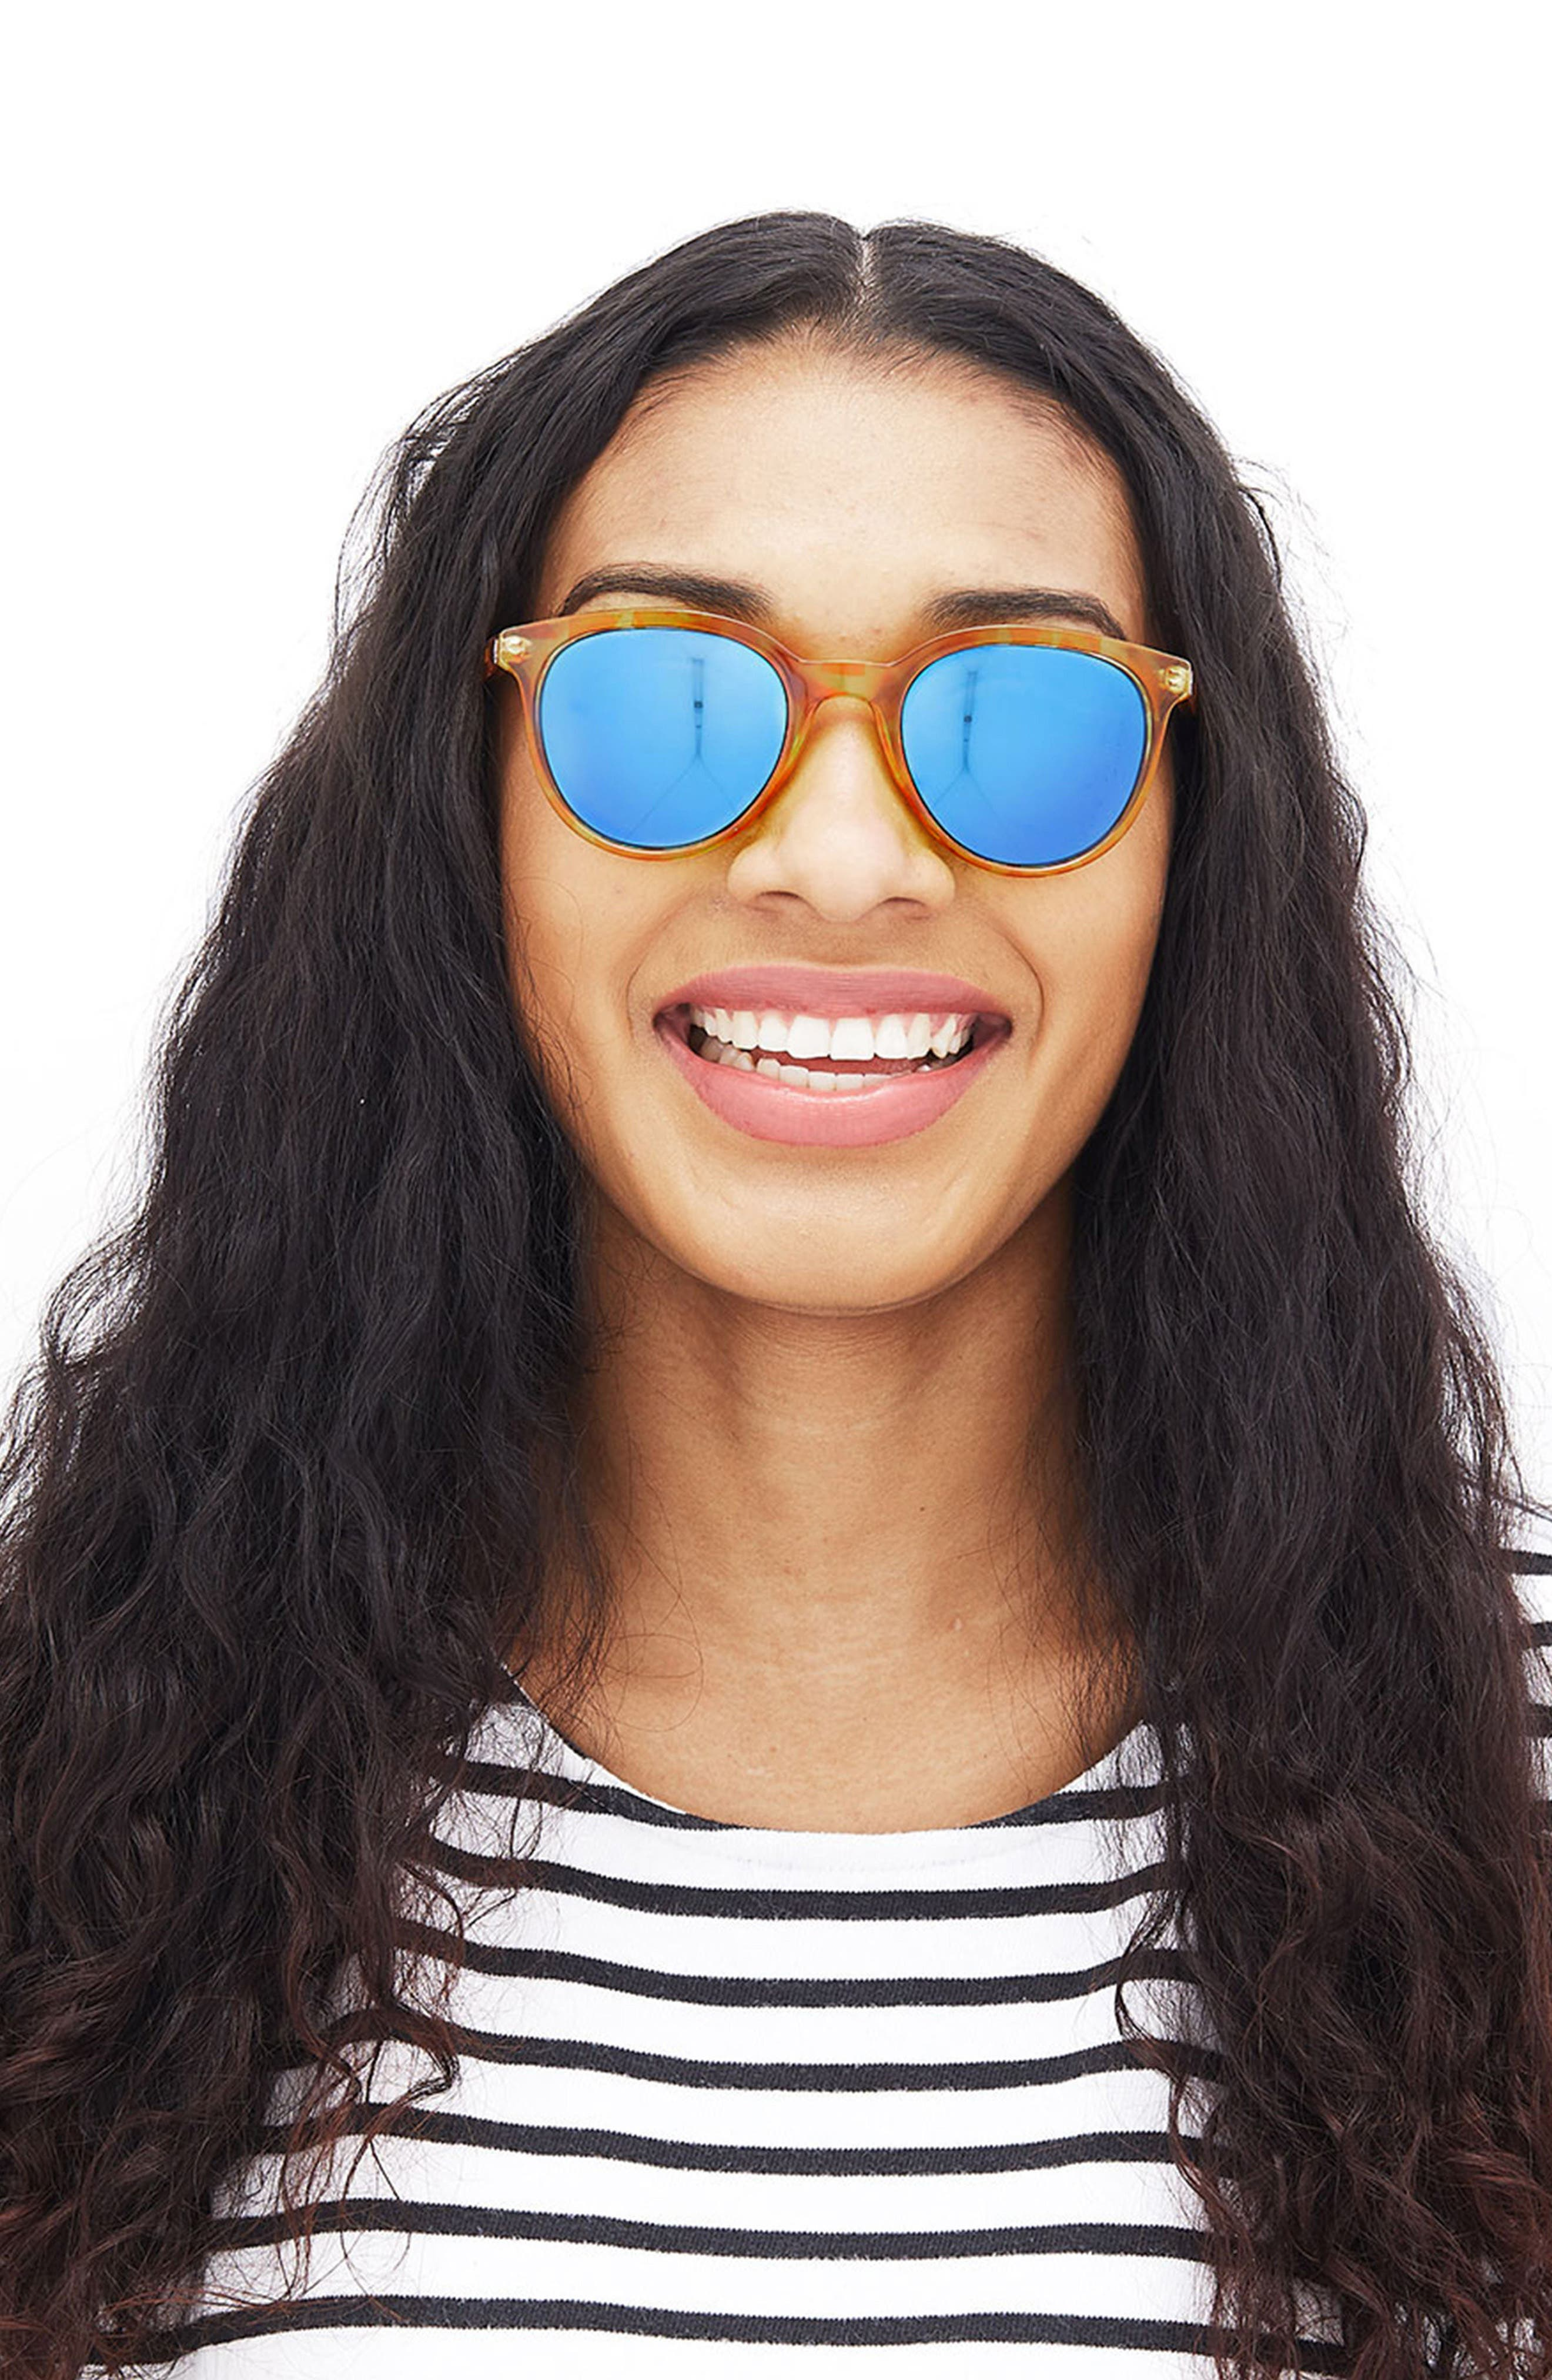 Makani 51mm Mirrored Polarized Sunglasses,                             Alternate thumbnail 2, color,                             Blond Tortoise/ Aqua